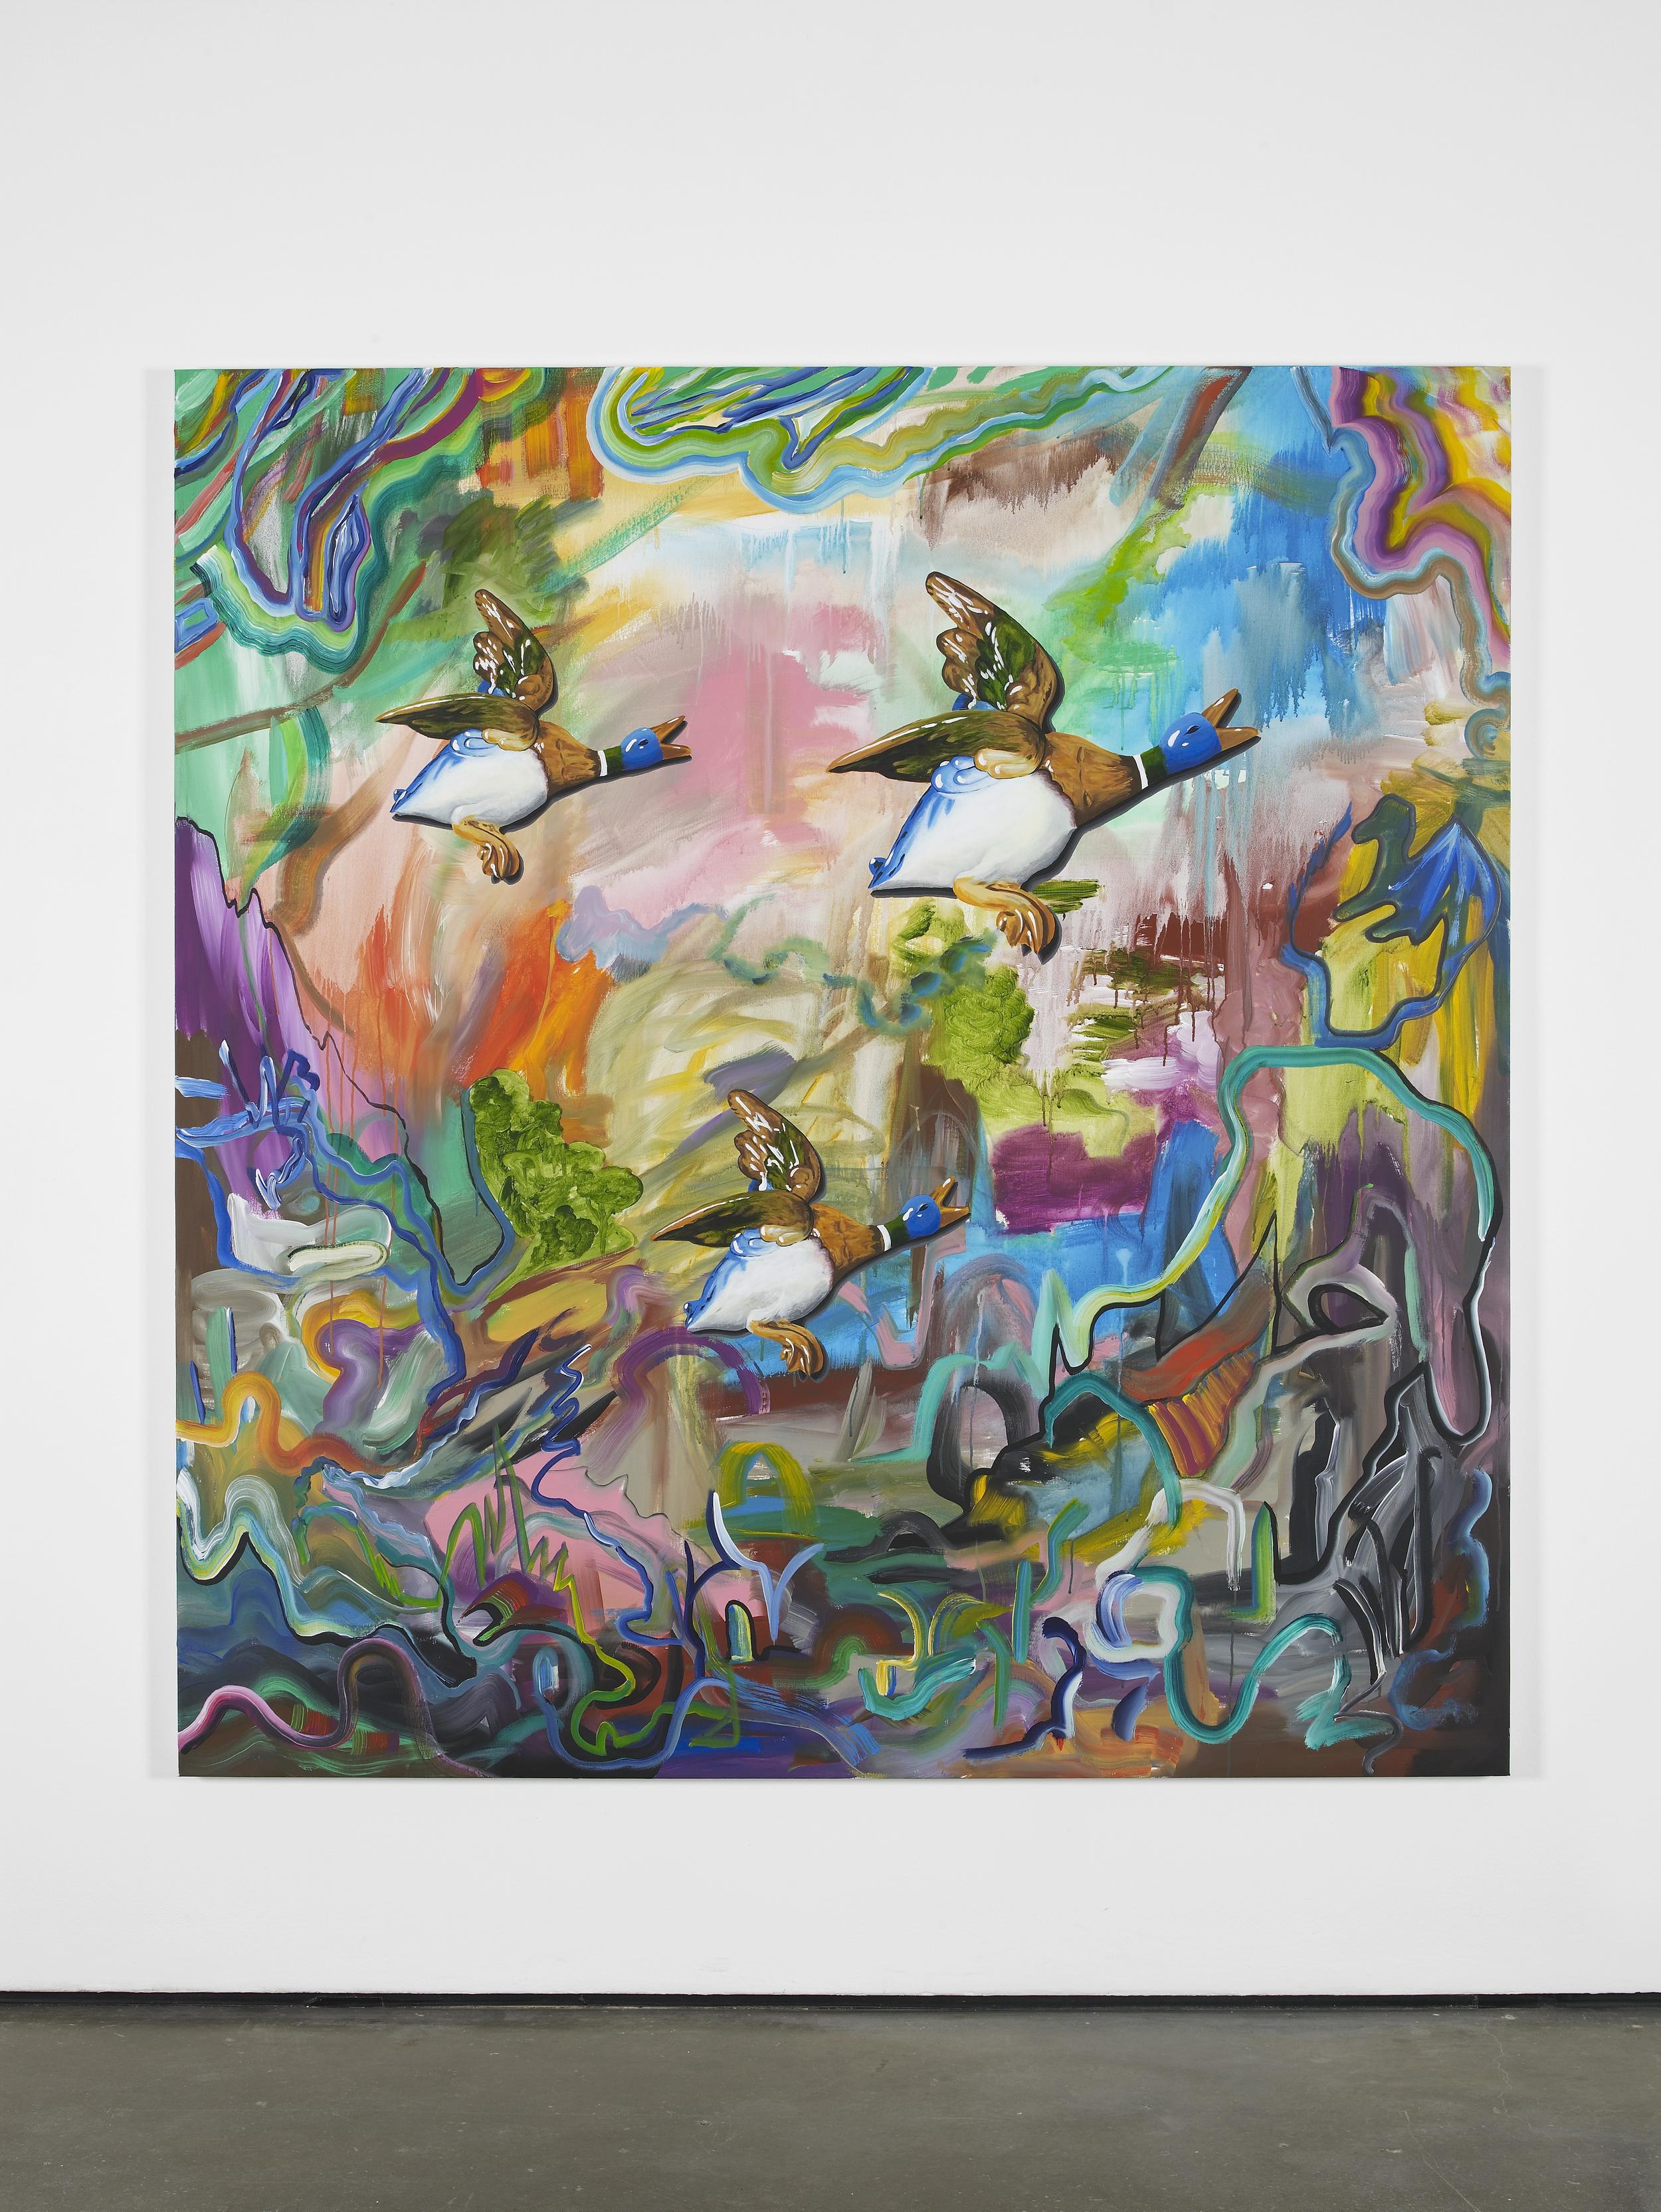 Candor dat viribus alas 2014 Acrylic on canvas 185 x 175 cm / 72.8 x 68.8 in